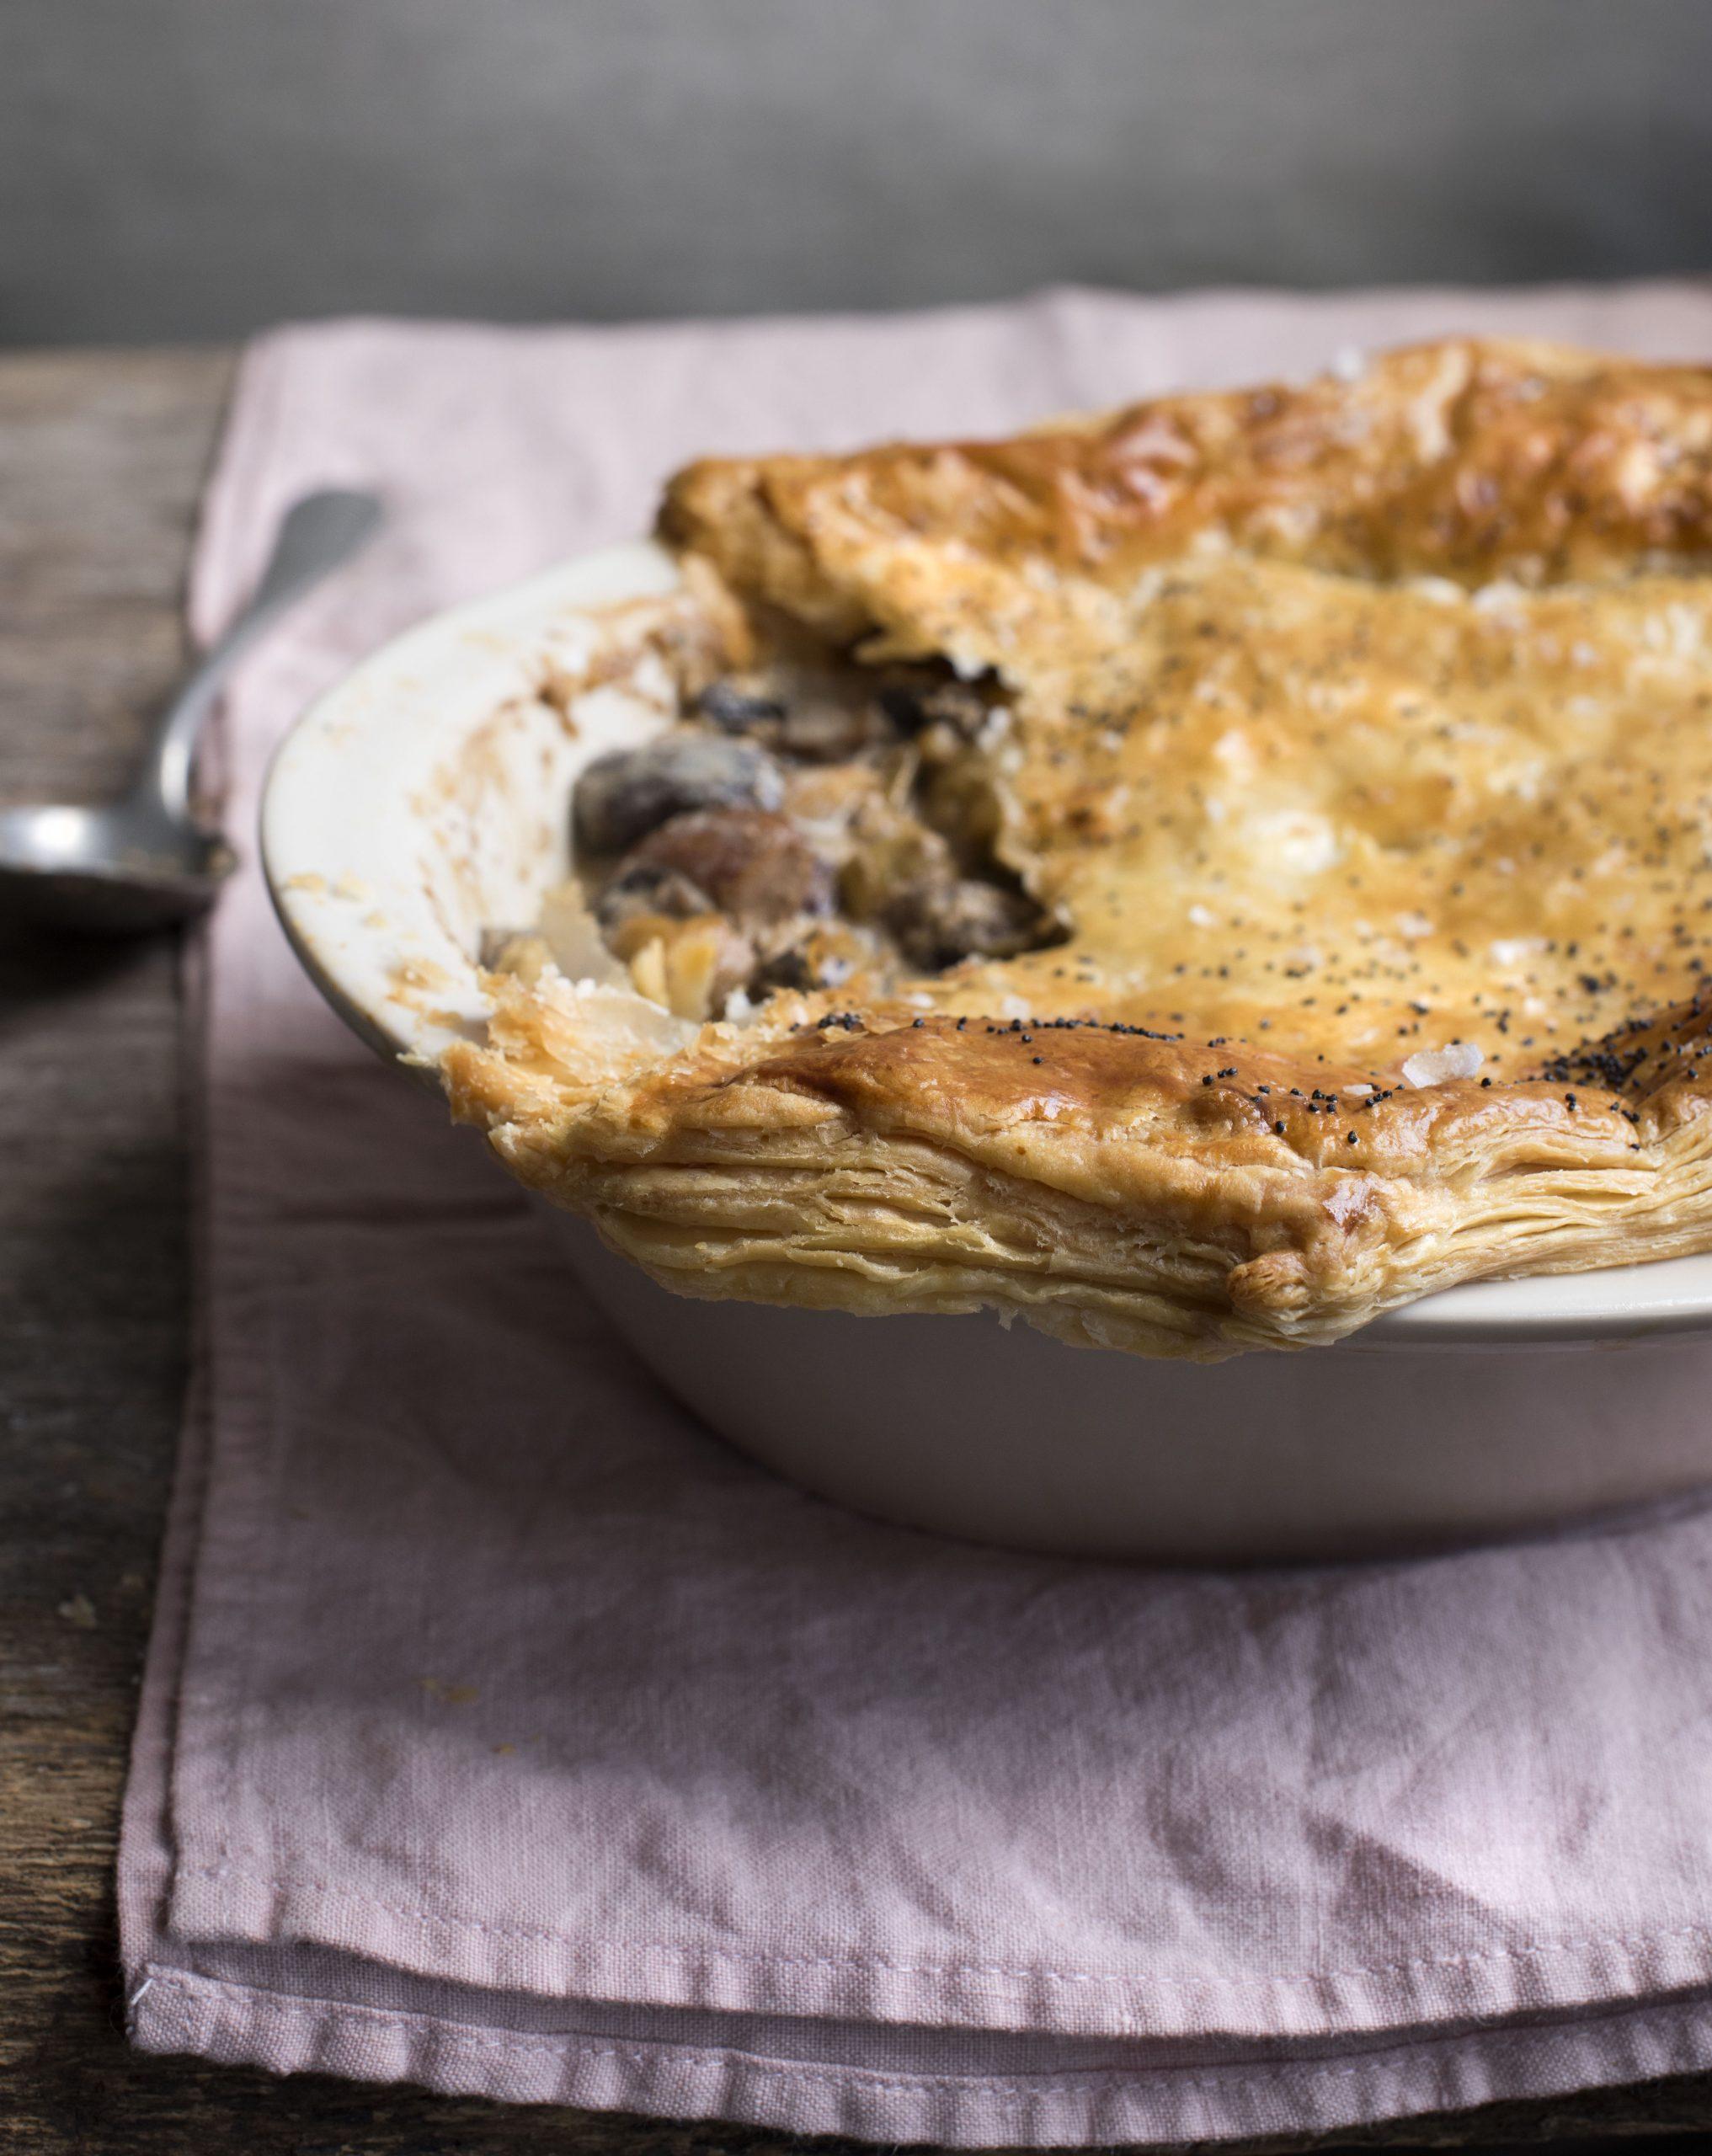 Recipe: Creamy Mushroom & Chestnut Pie